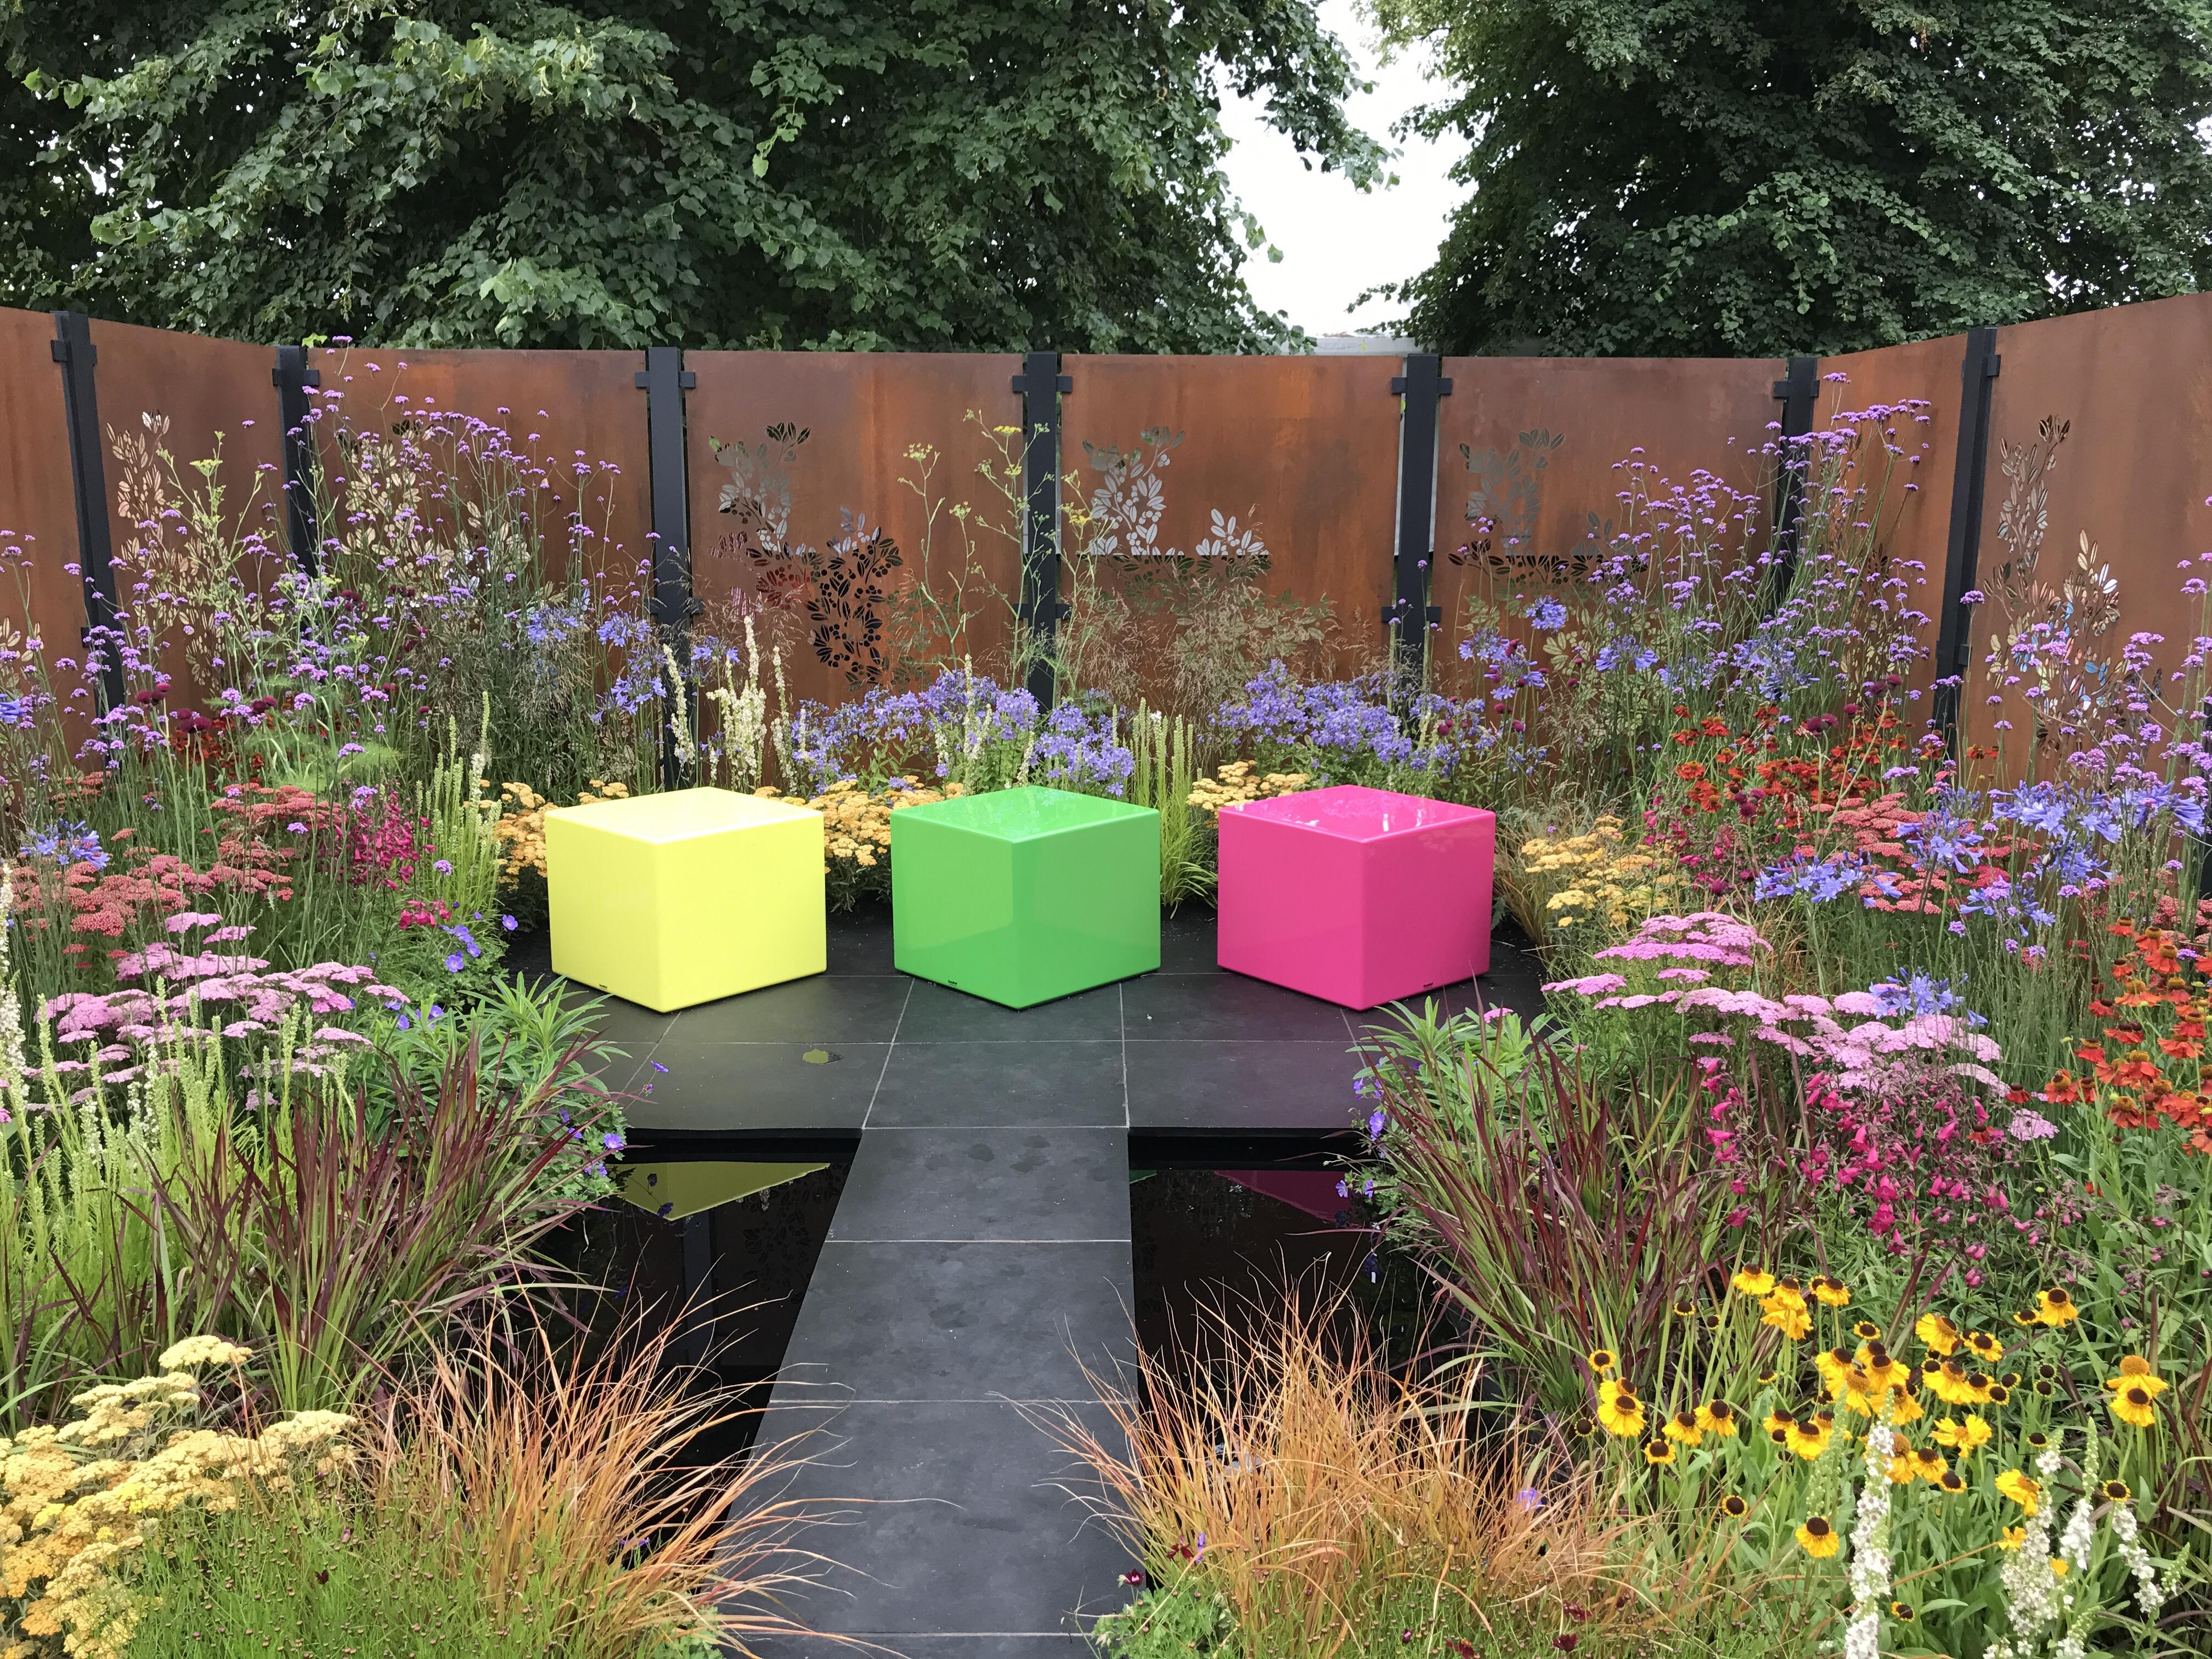 img 0047 Hampton court flower show, a brief summary